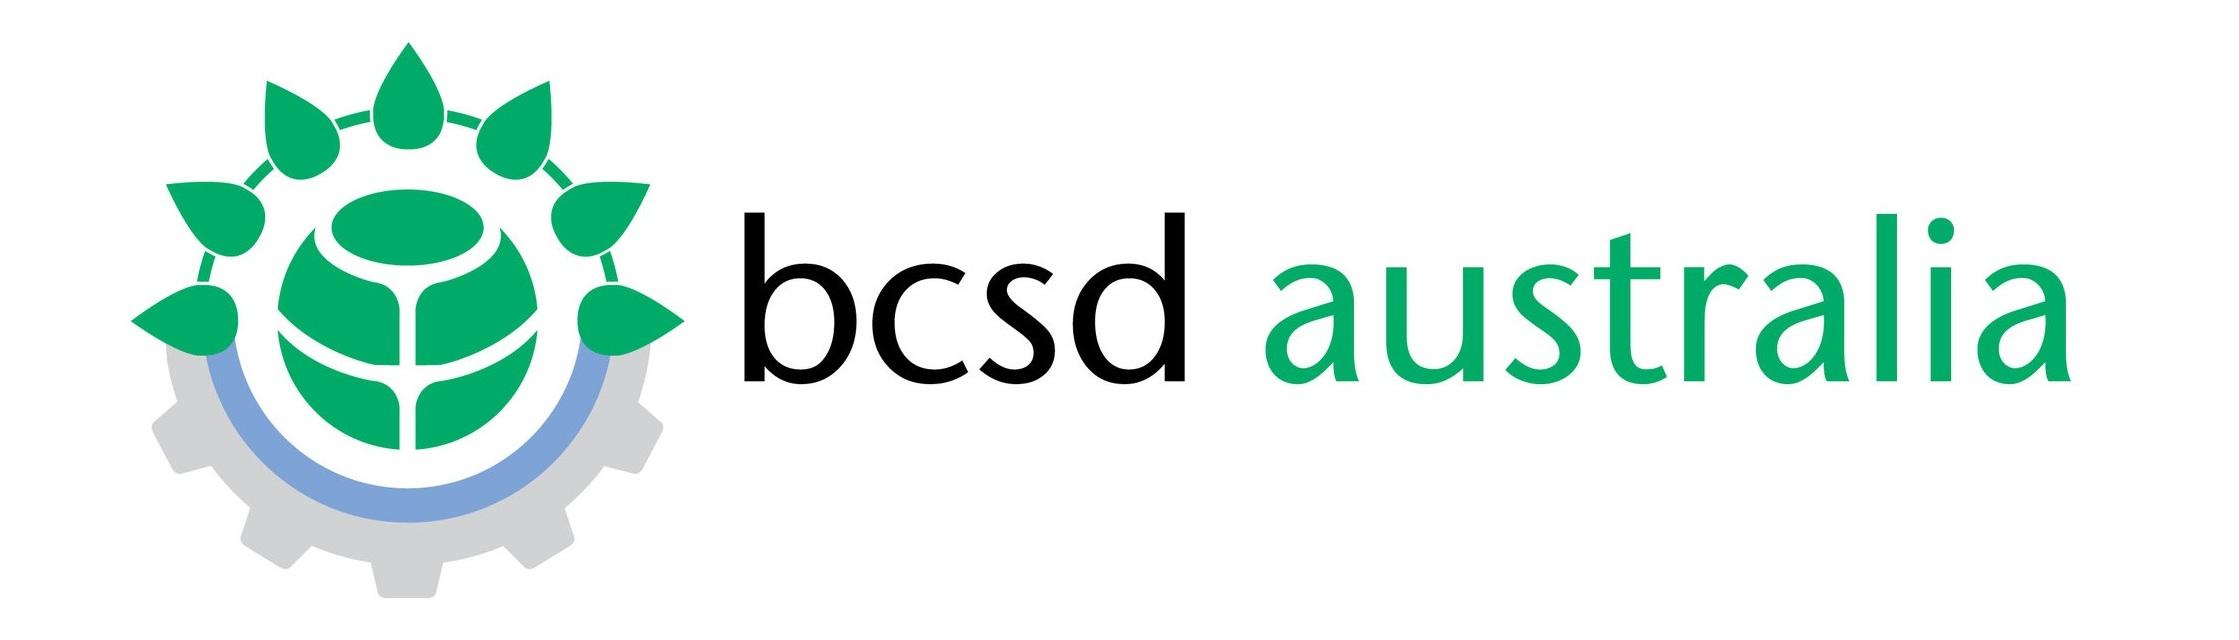 bcsd_australia_rgb.jpg